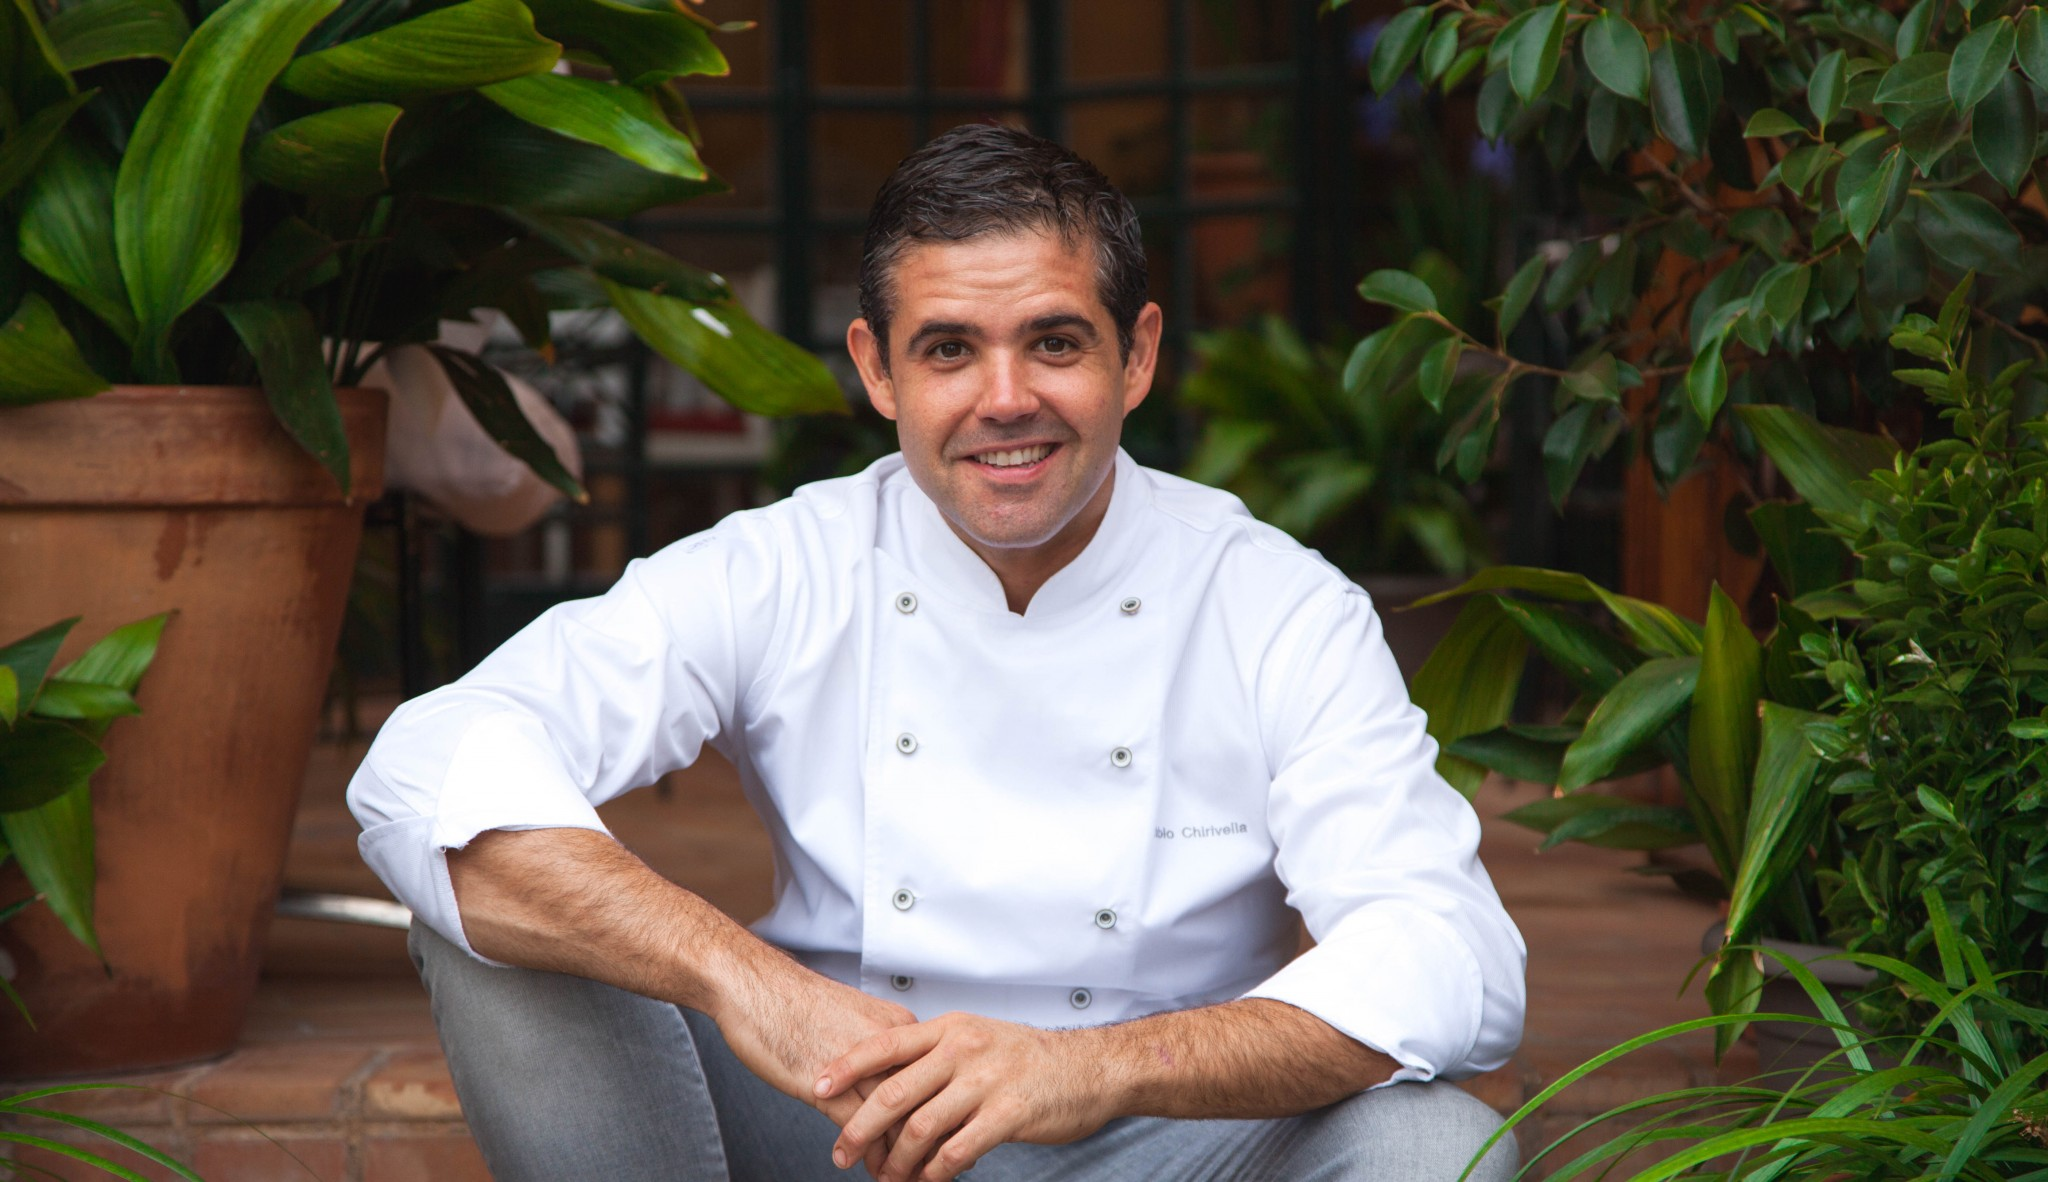 Pablo Chirivella